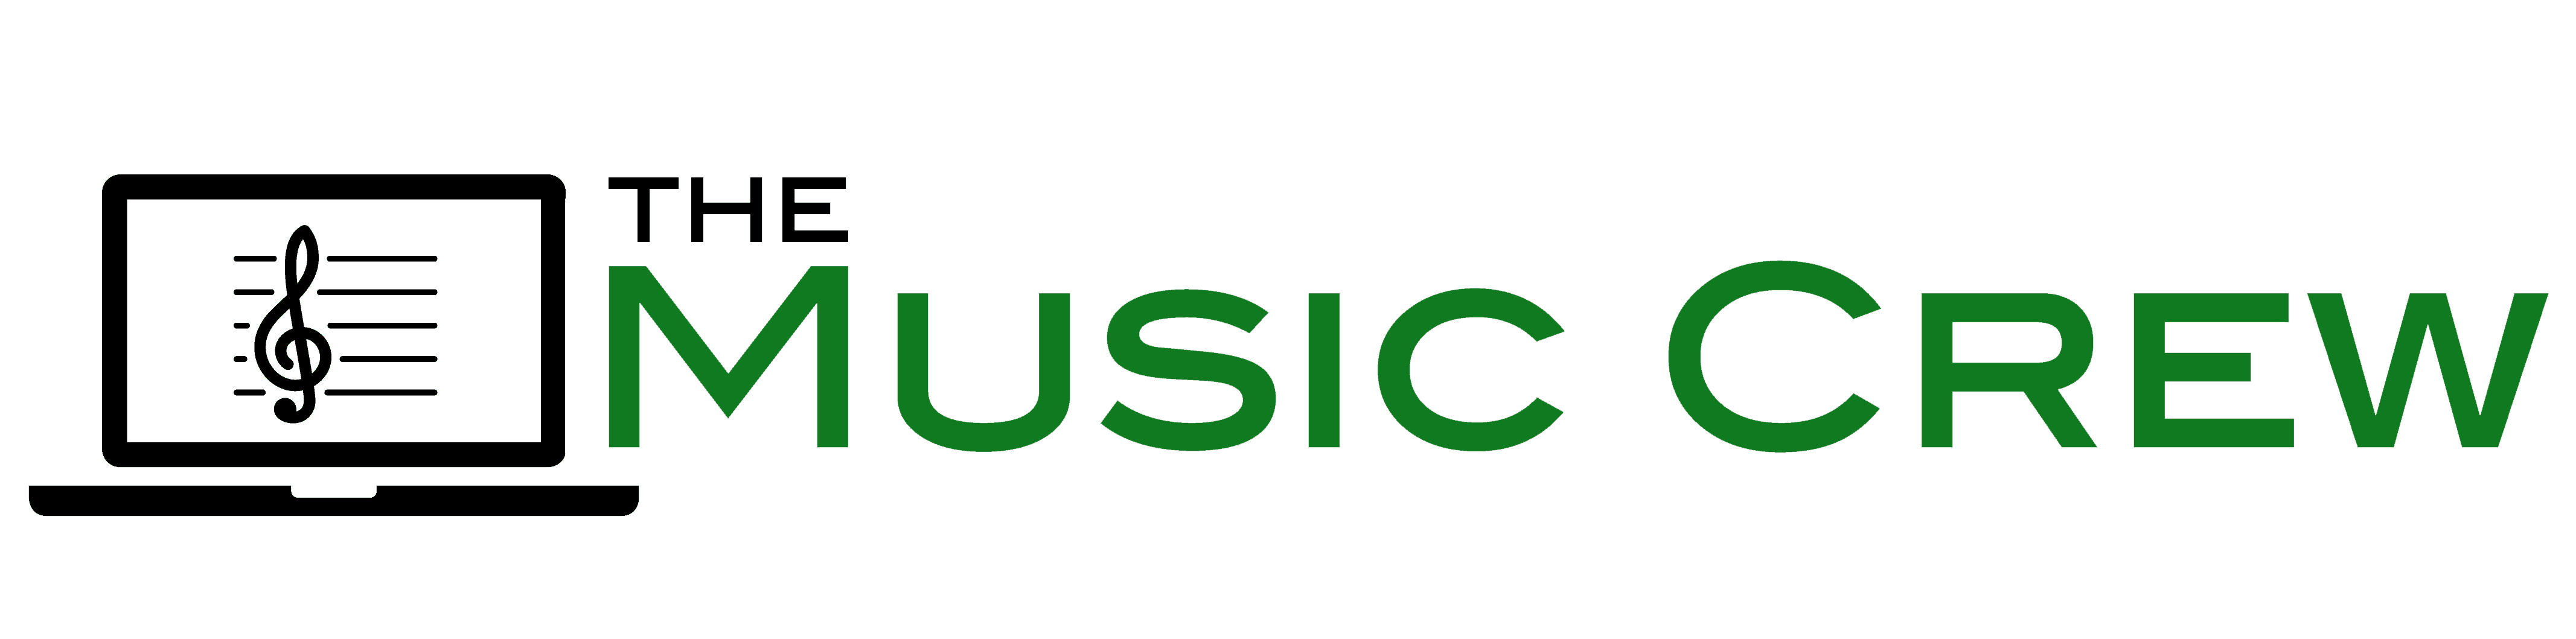 TPT Music Crew Logo